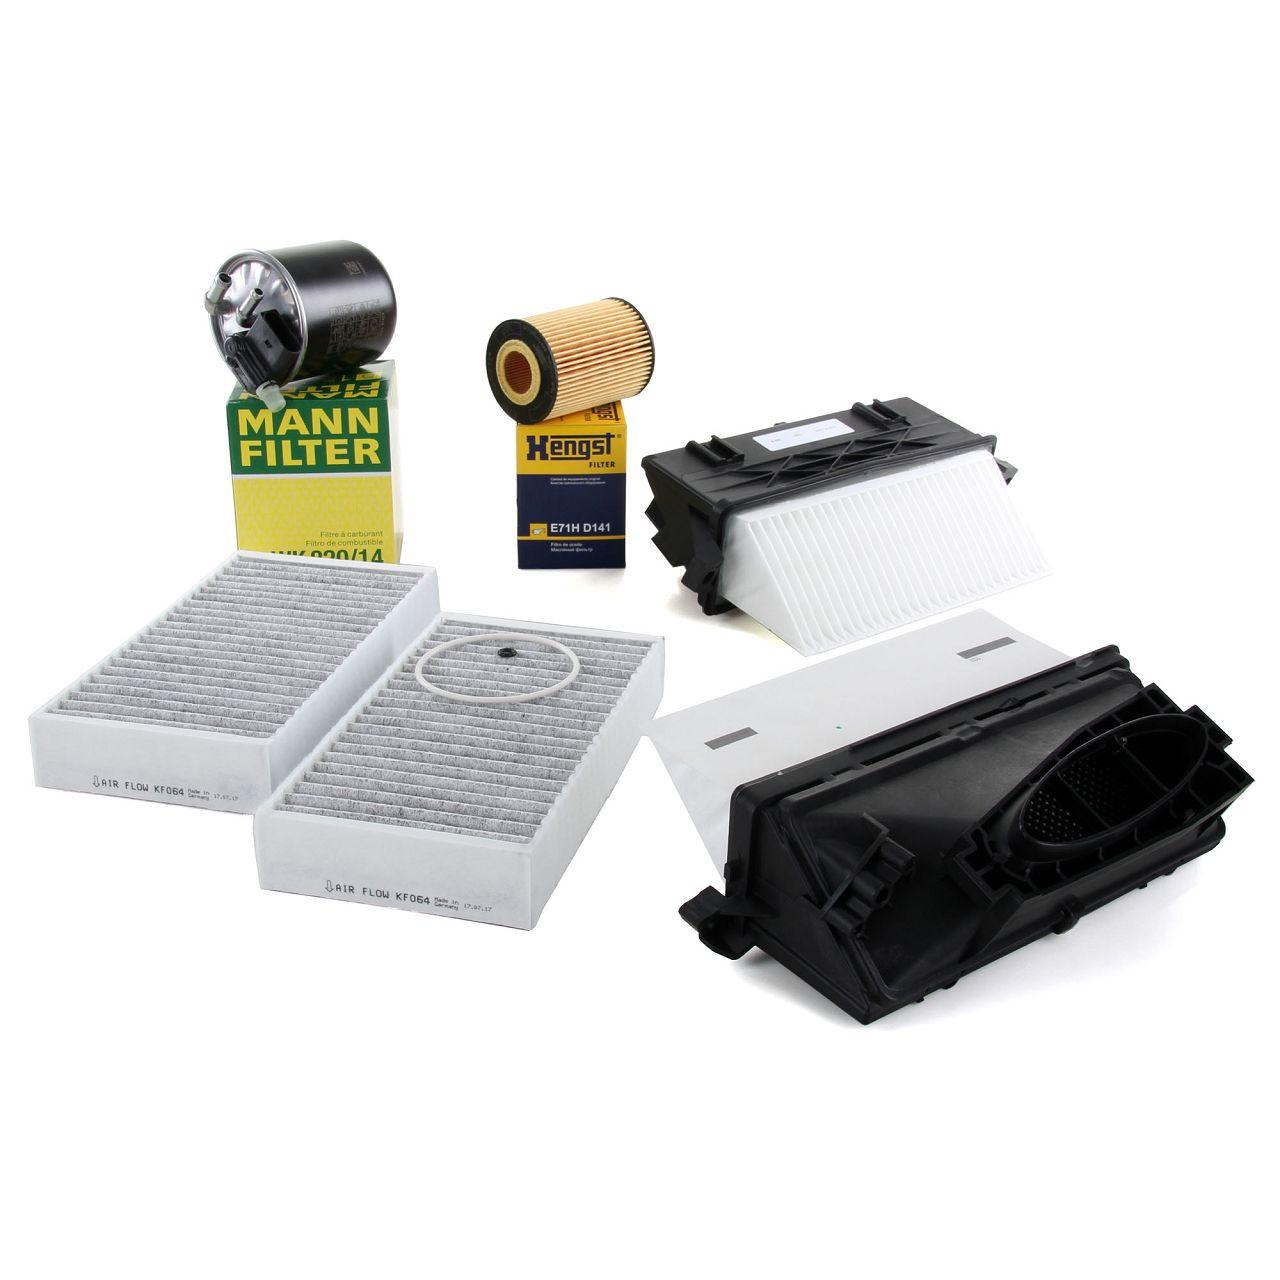 Filterset für MERCEDES GL-KLASSE X164 GL 320 CDI / 350 BlueTEC 4-matic 211 PS